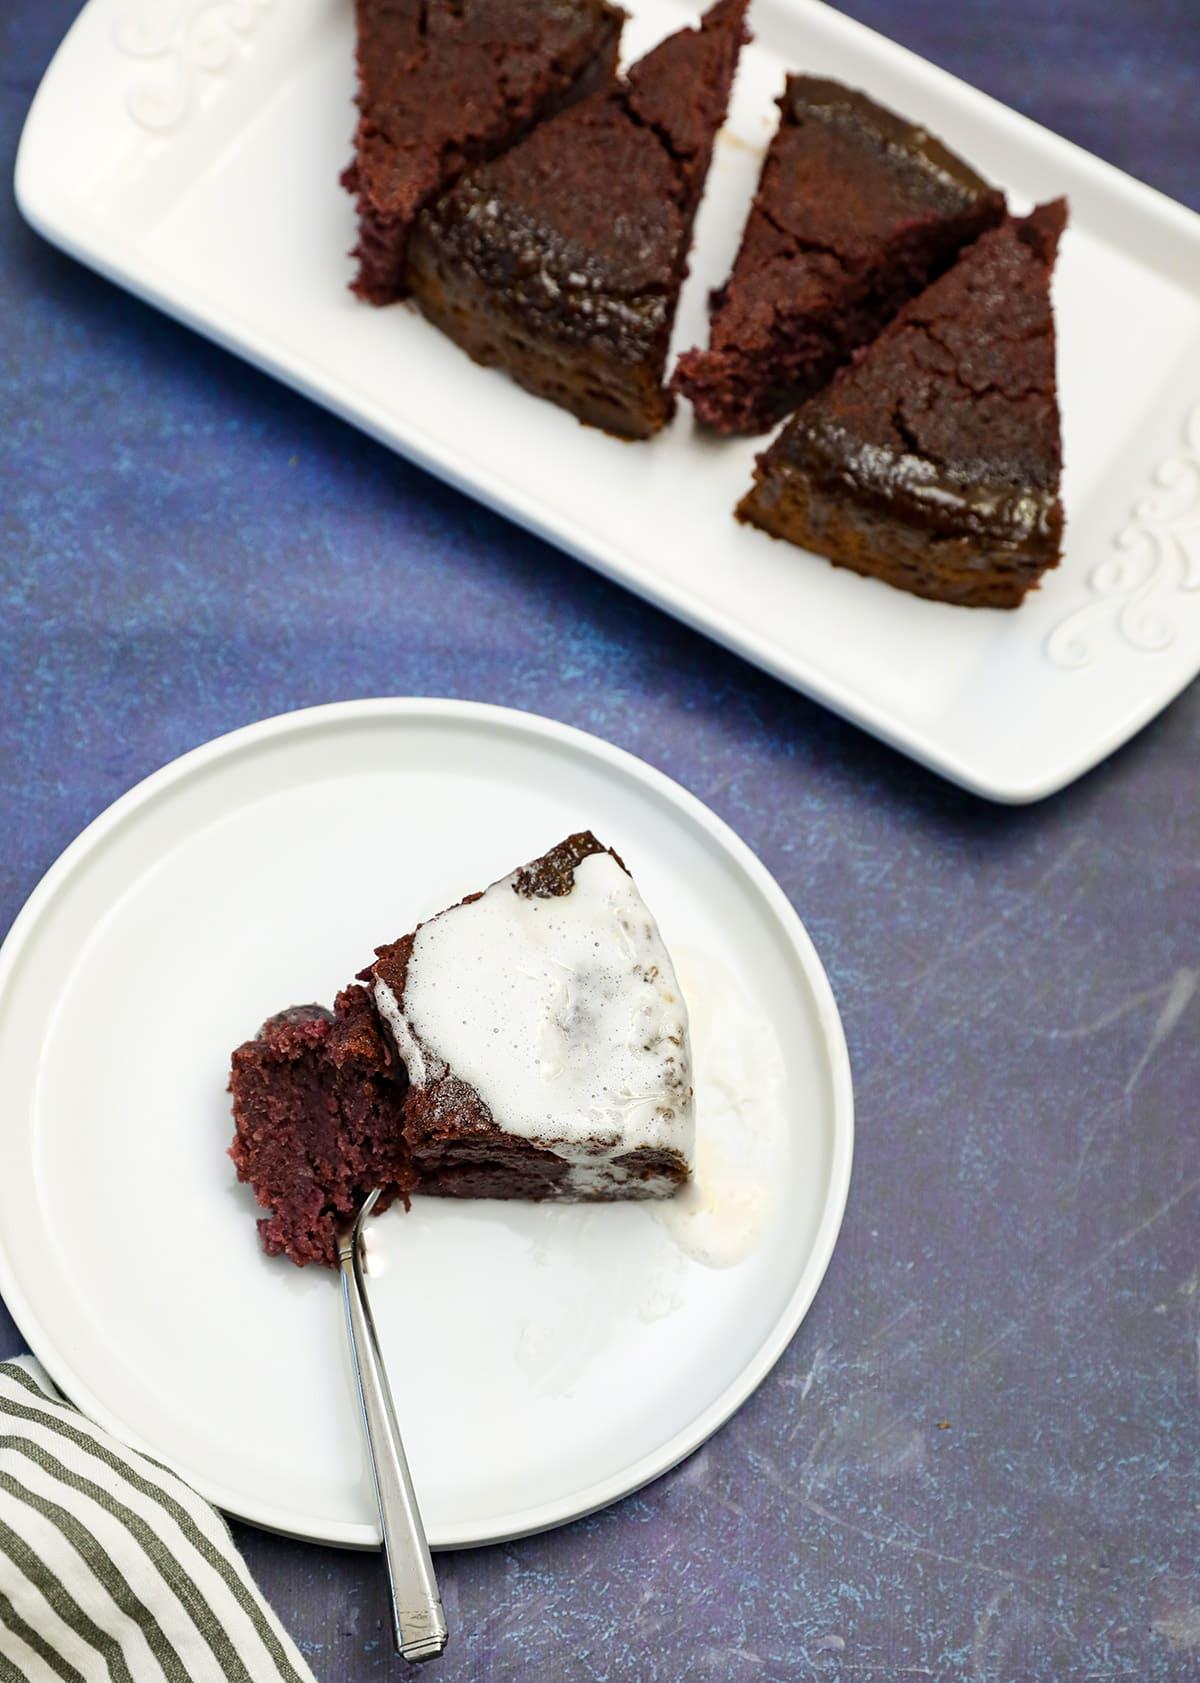 Purple sweet potato pudding overlay, slices of purple sweet potato in white platter and white plate